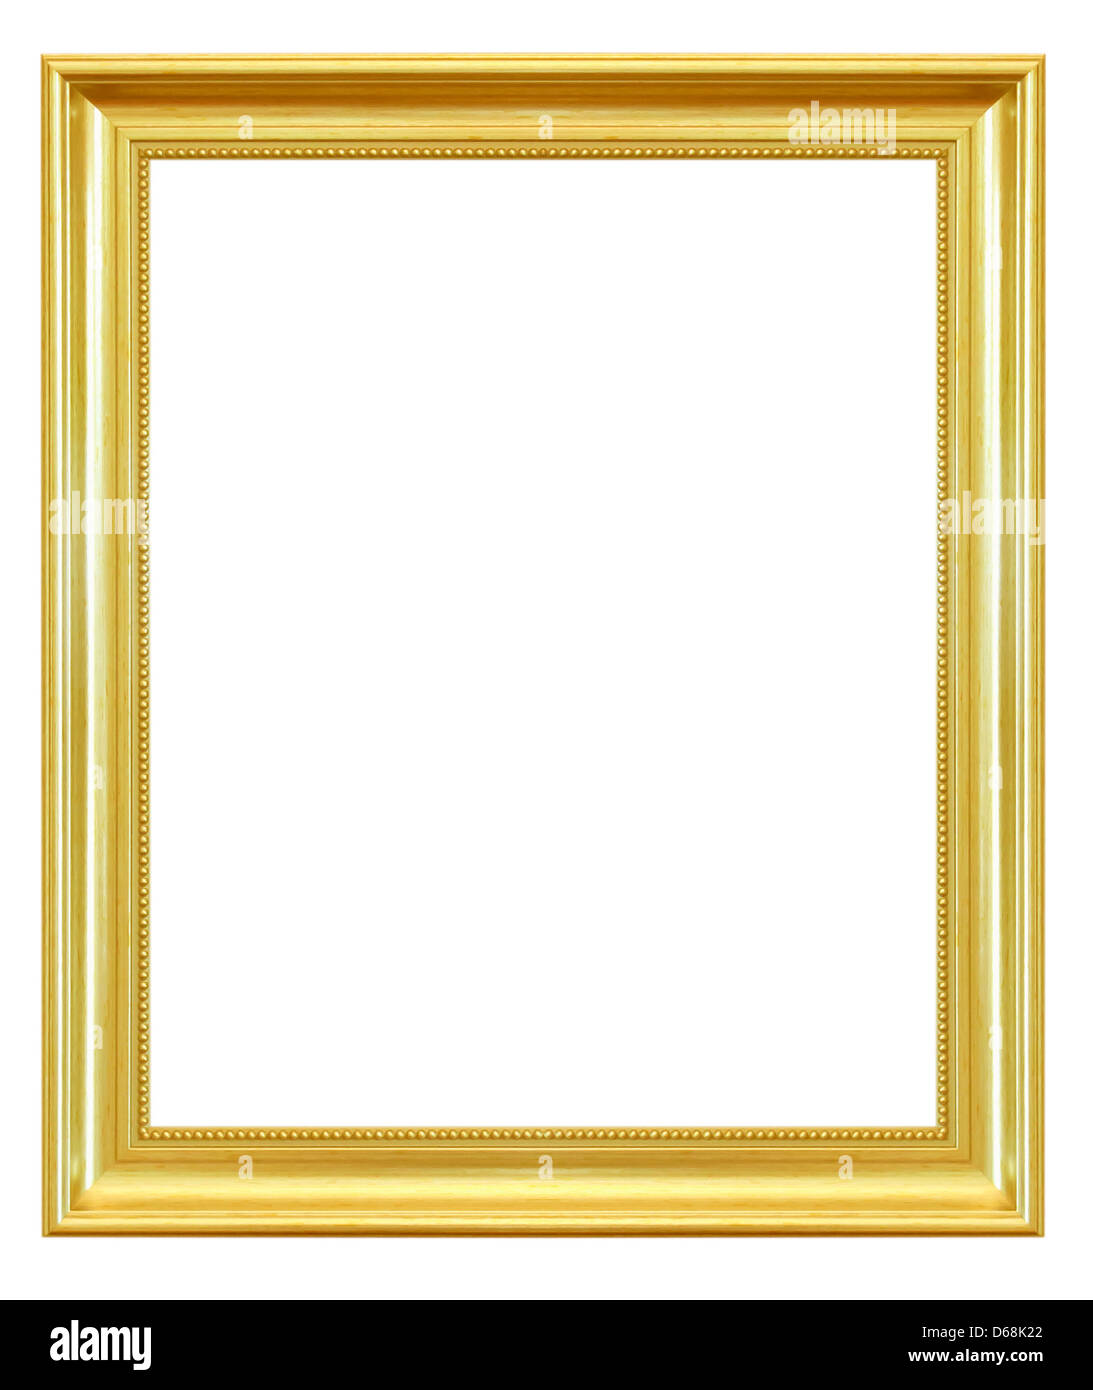 Marco de madera de oro antigua fondo blanco Foto & Imagen De Stock ...